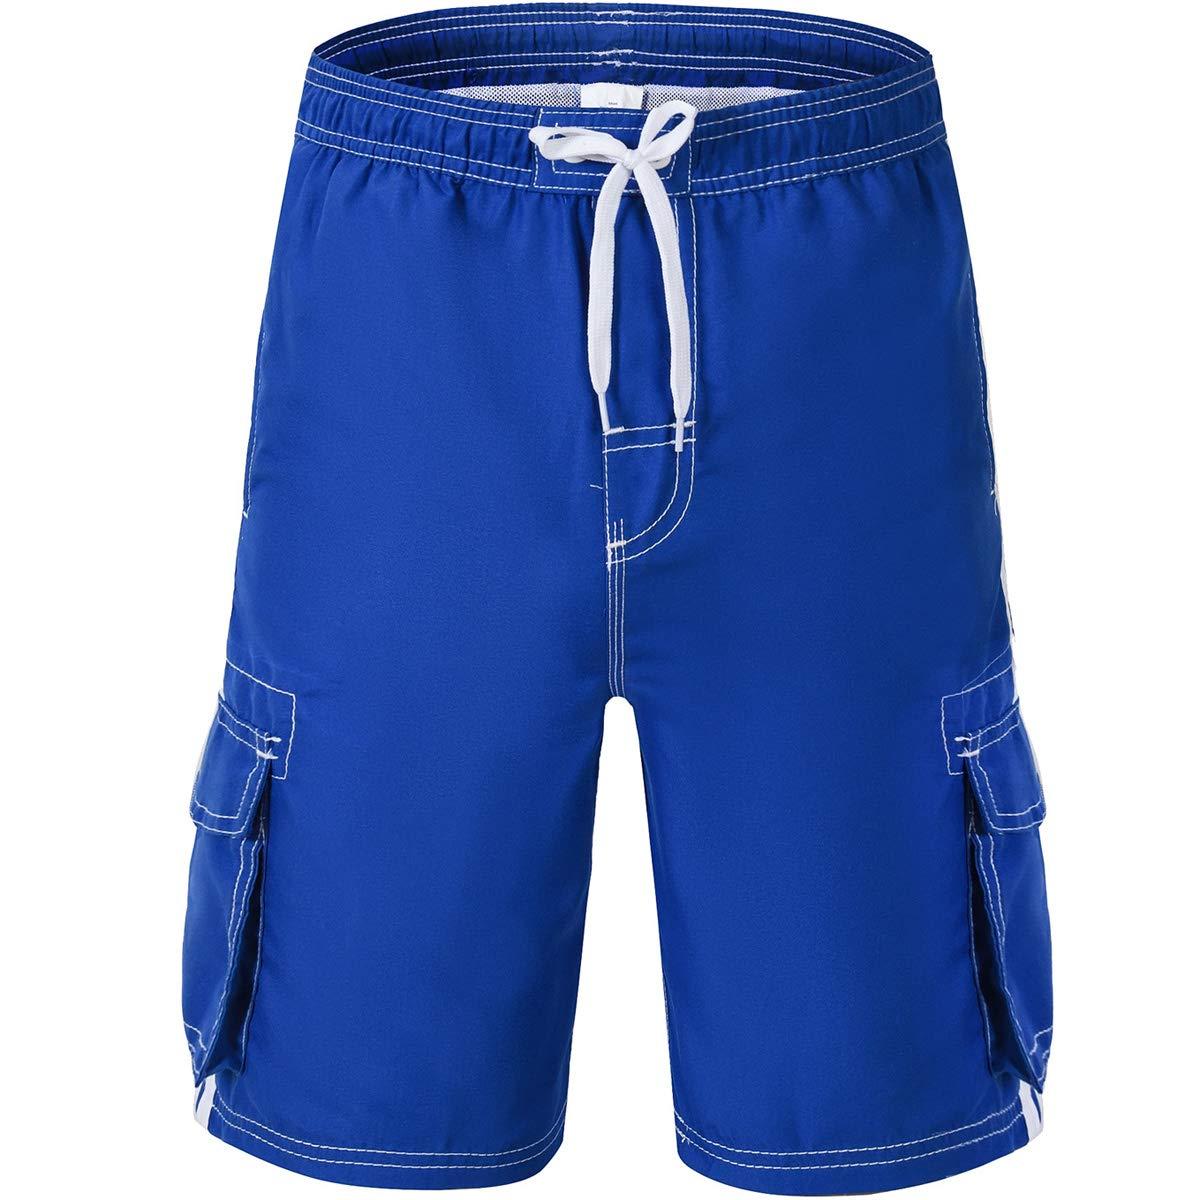 Akula Boys' Quick Dry Beach Board Shorts Swim Trunk with Pockets XTB1801-BOYS